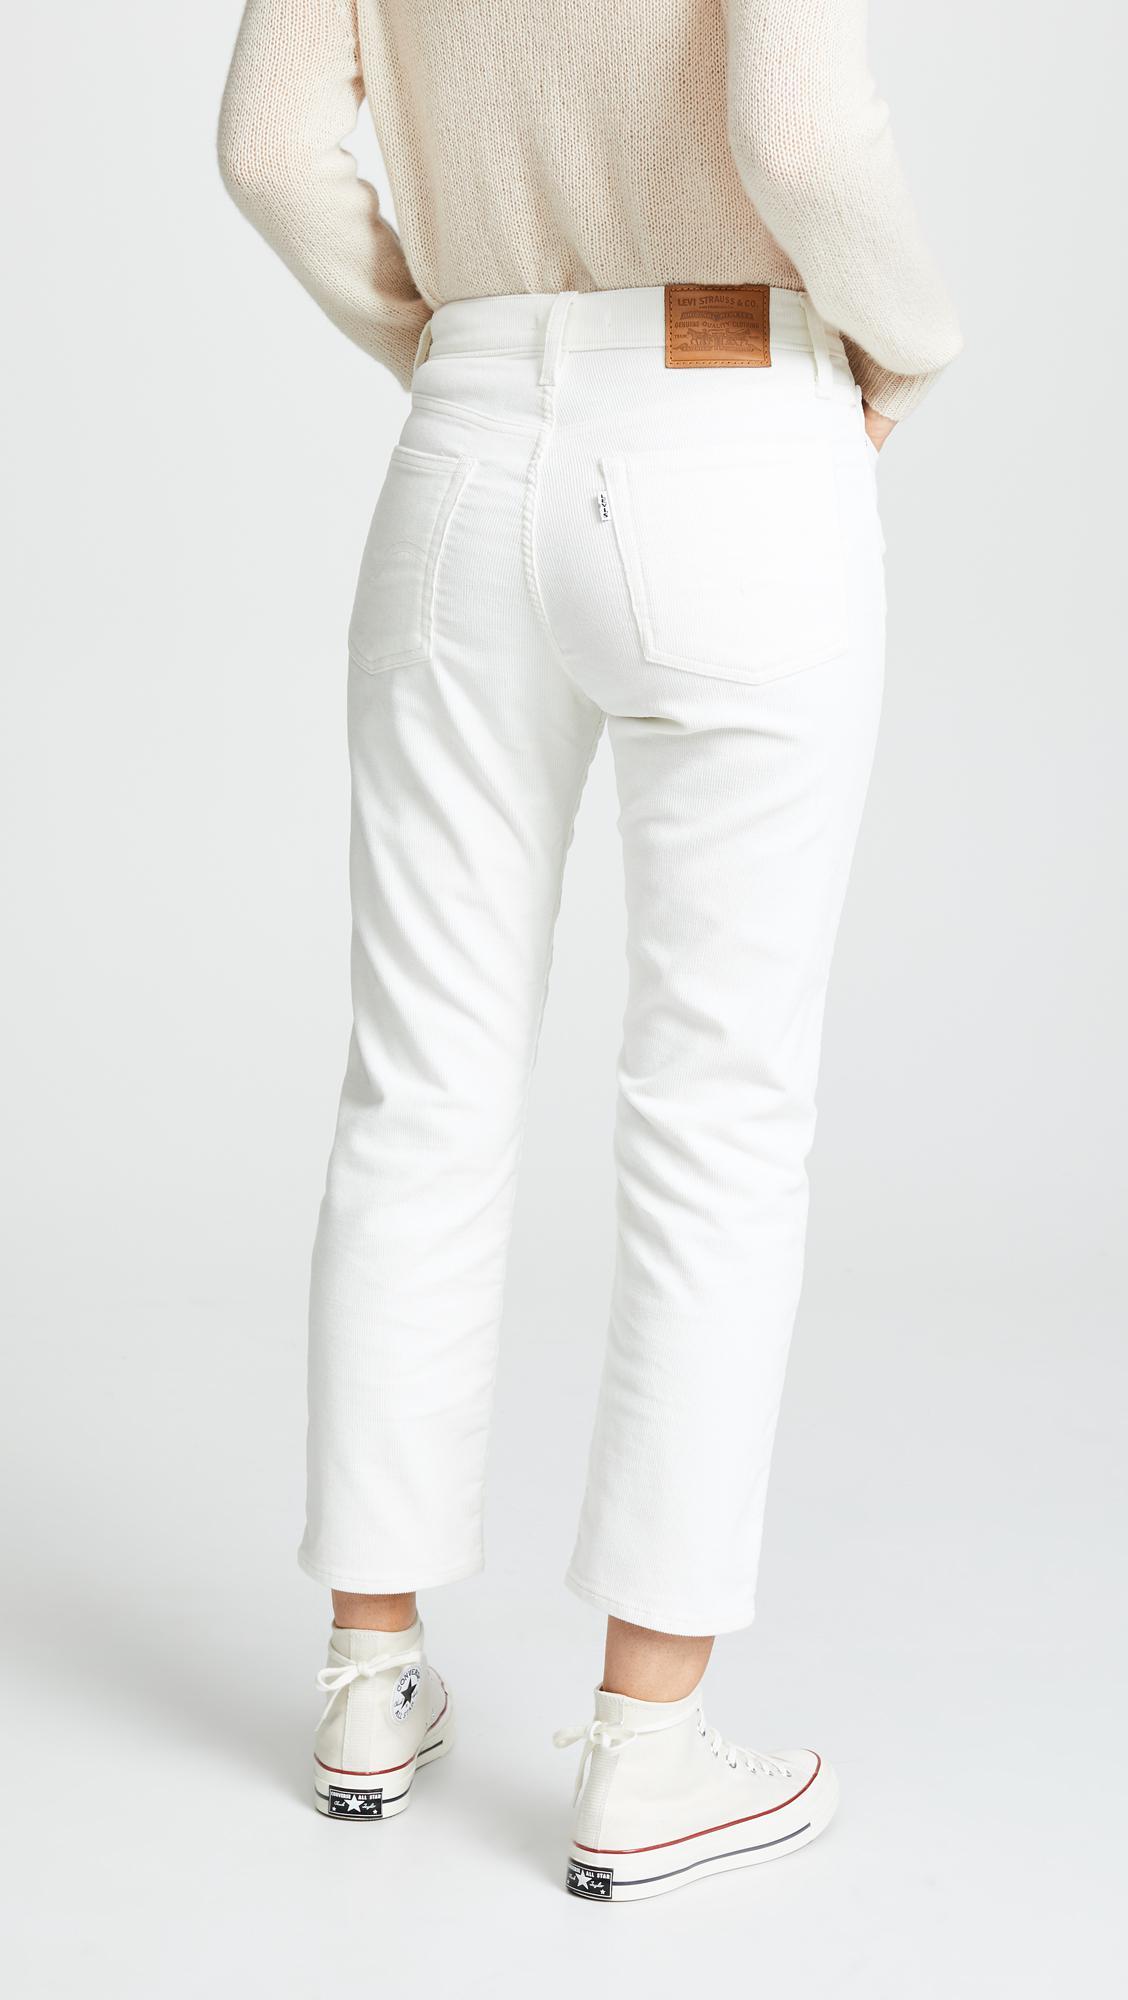 6w1qihwvs Lyst Jeans Wedgie White In Corduroy Straight Levi's N8nOwmyv0